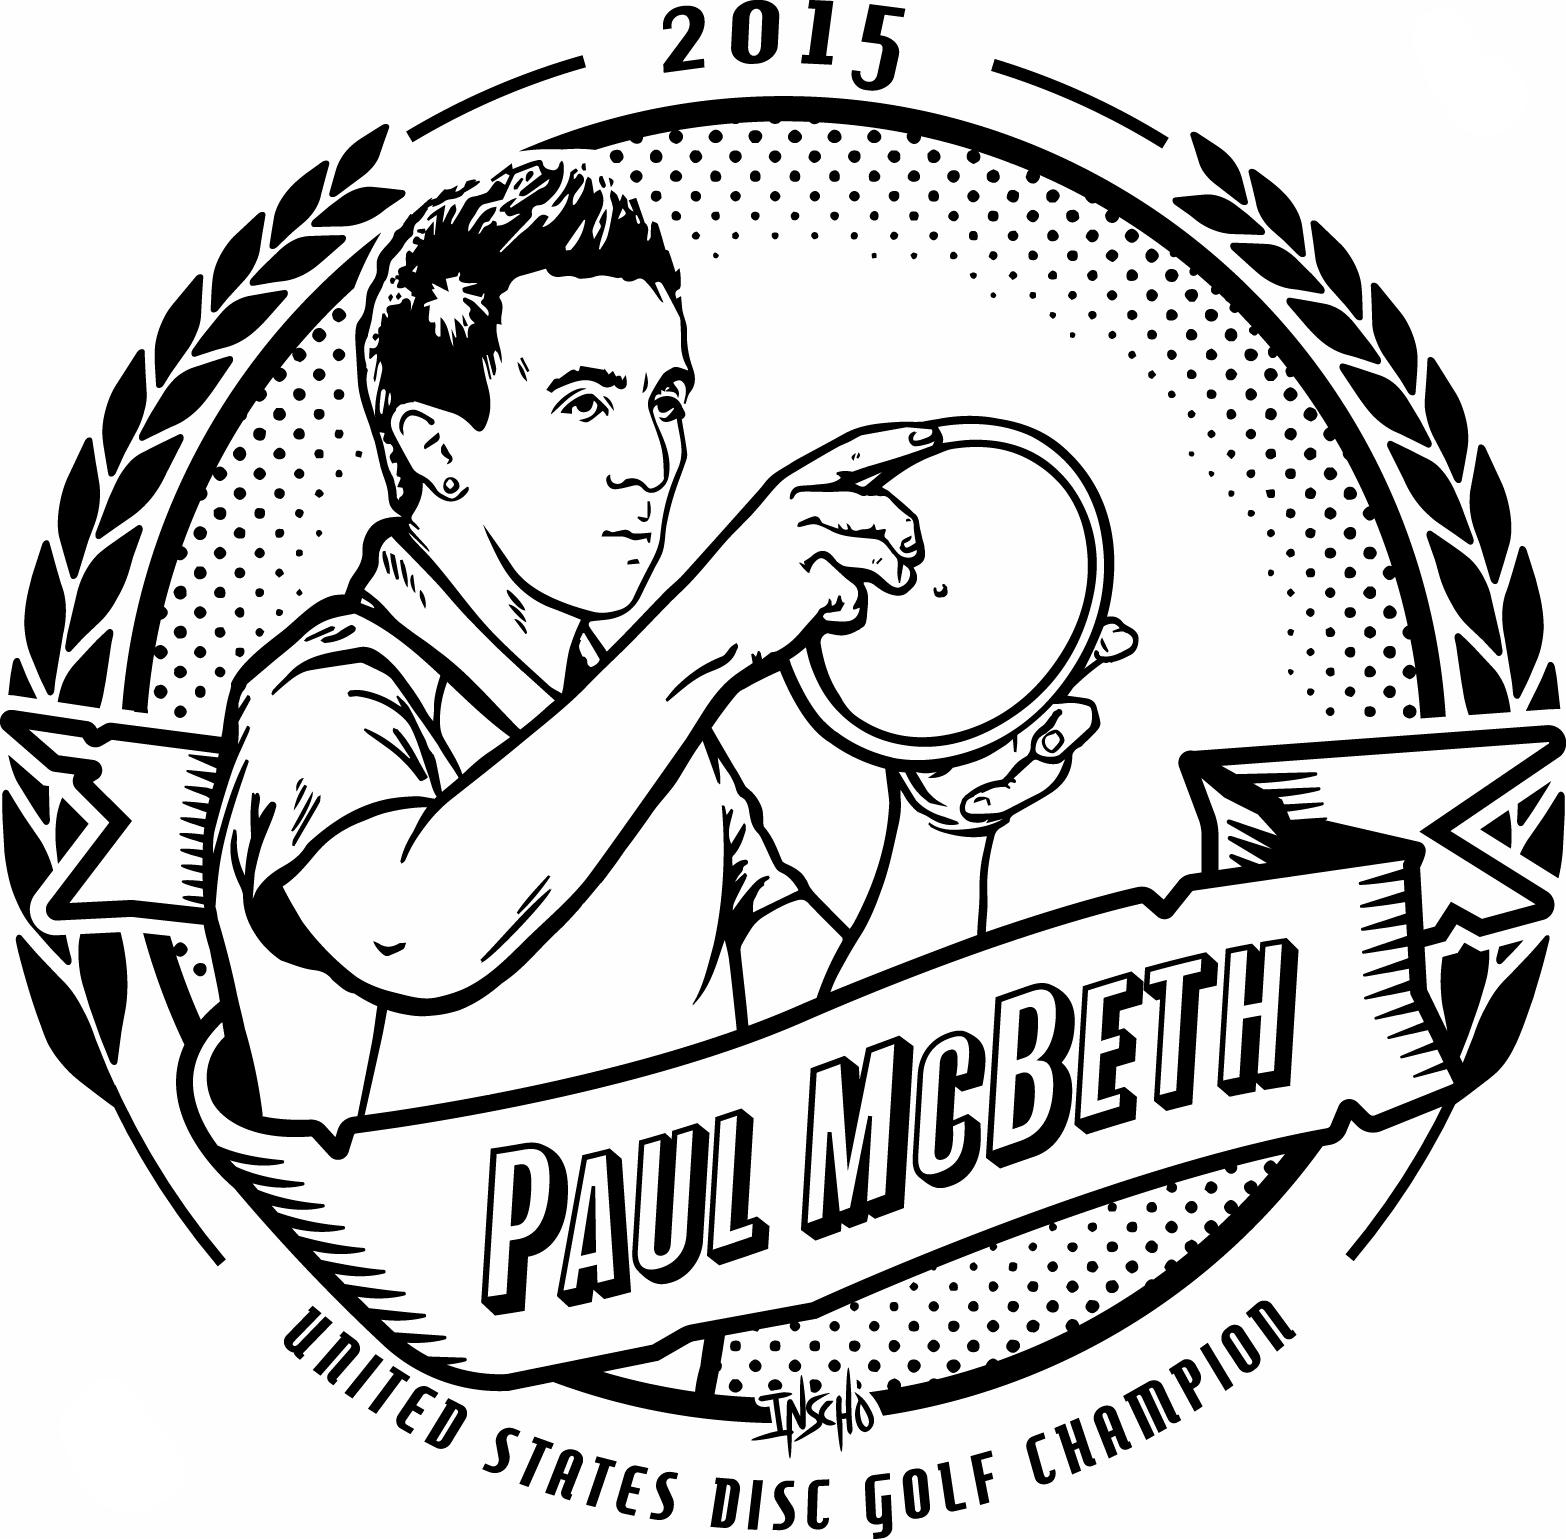 McBeth_Commemorative_Final10.jpg